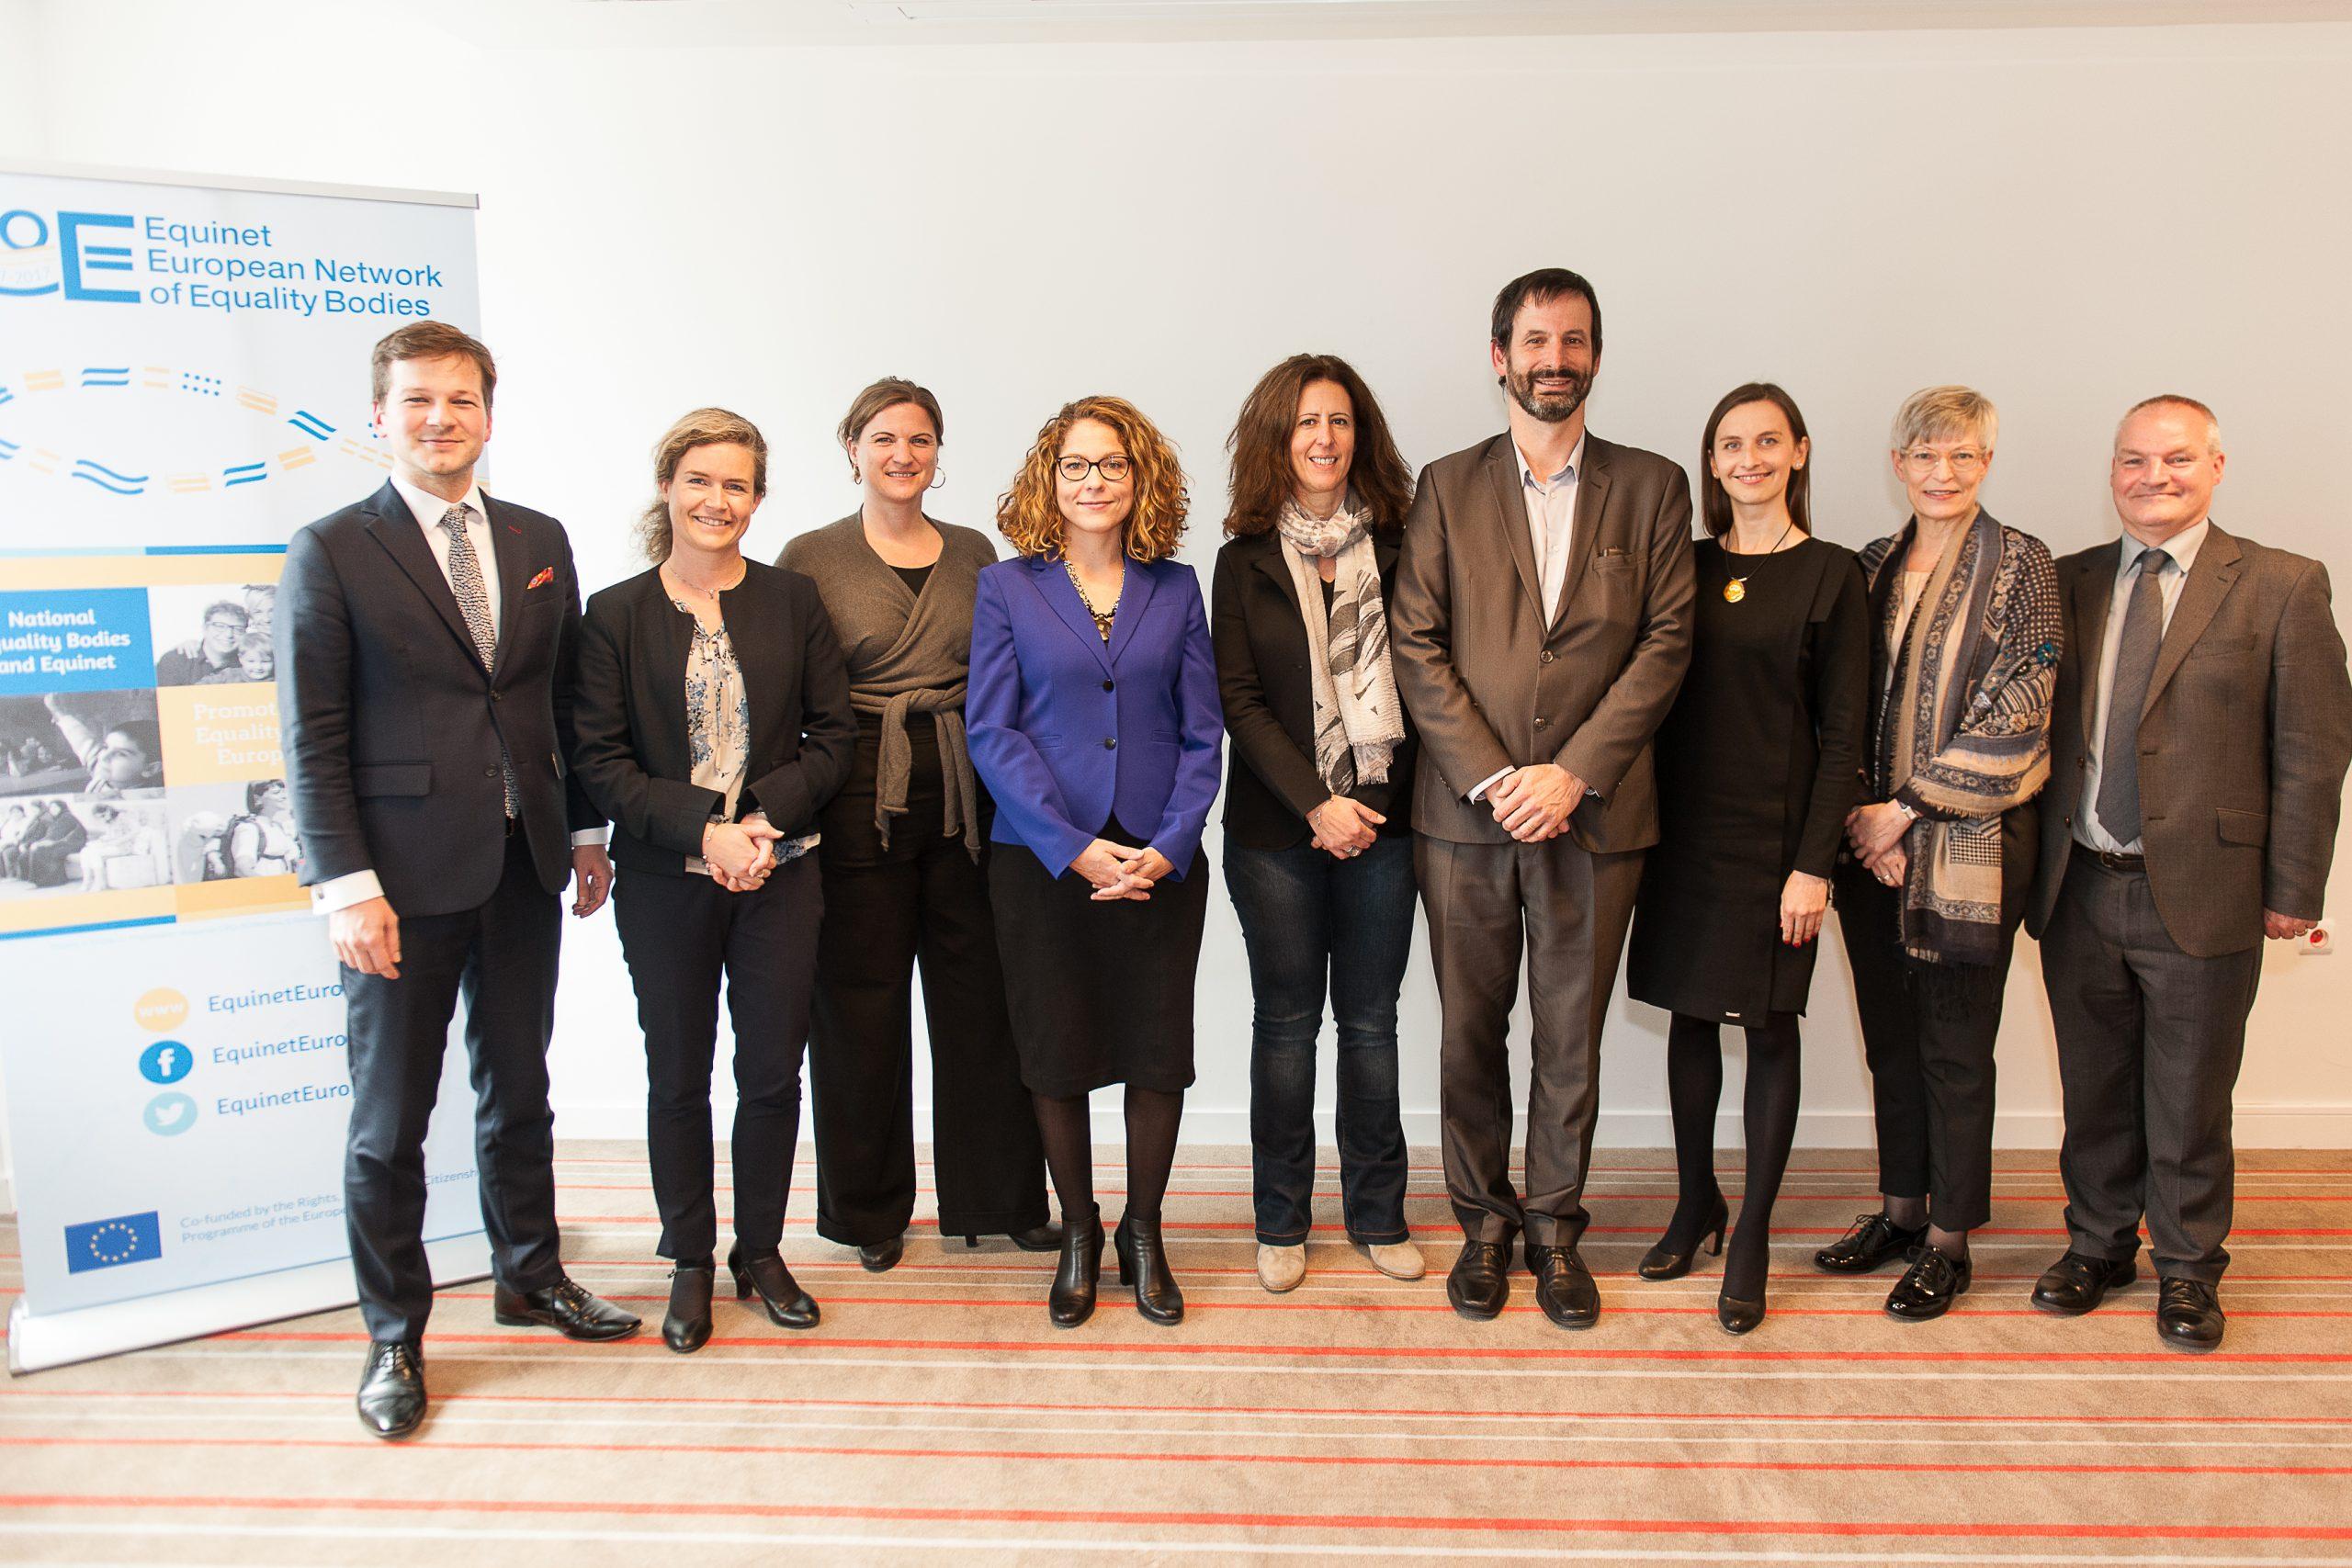 From left to right: P.Polák, V.Fontaine, S.Konstatzky, T.Šimonović Einwalter, K.Lykovardi, P.Charlier, S.Spurek, K.Pimiä, L.Bond